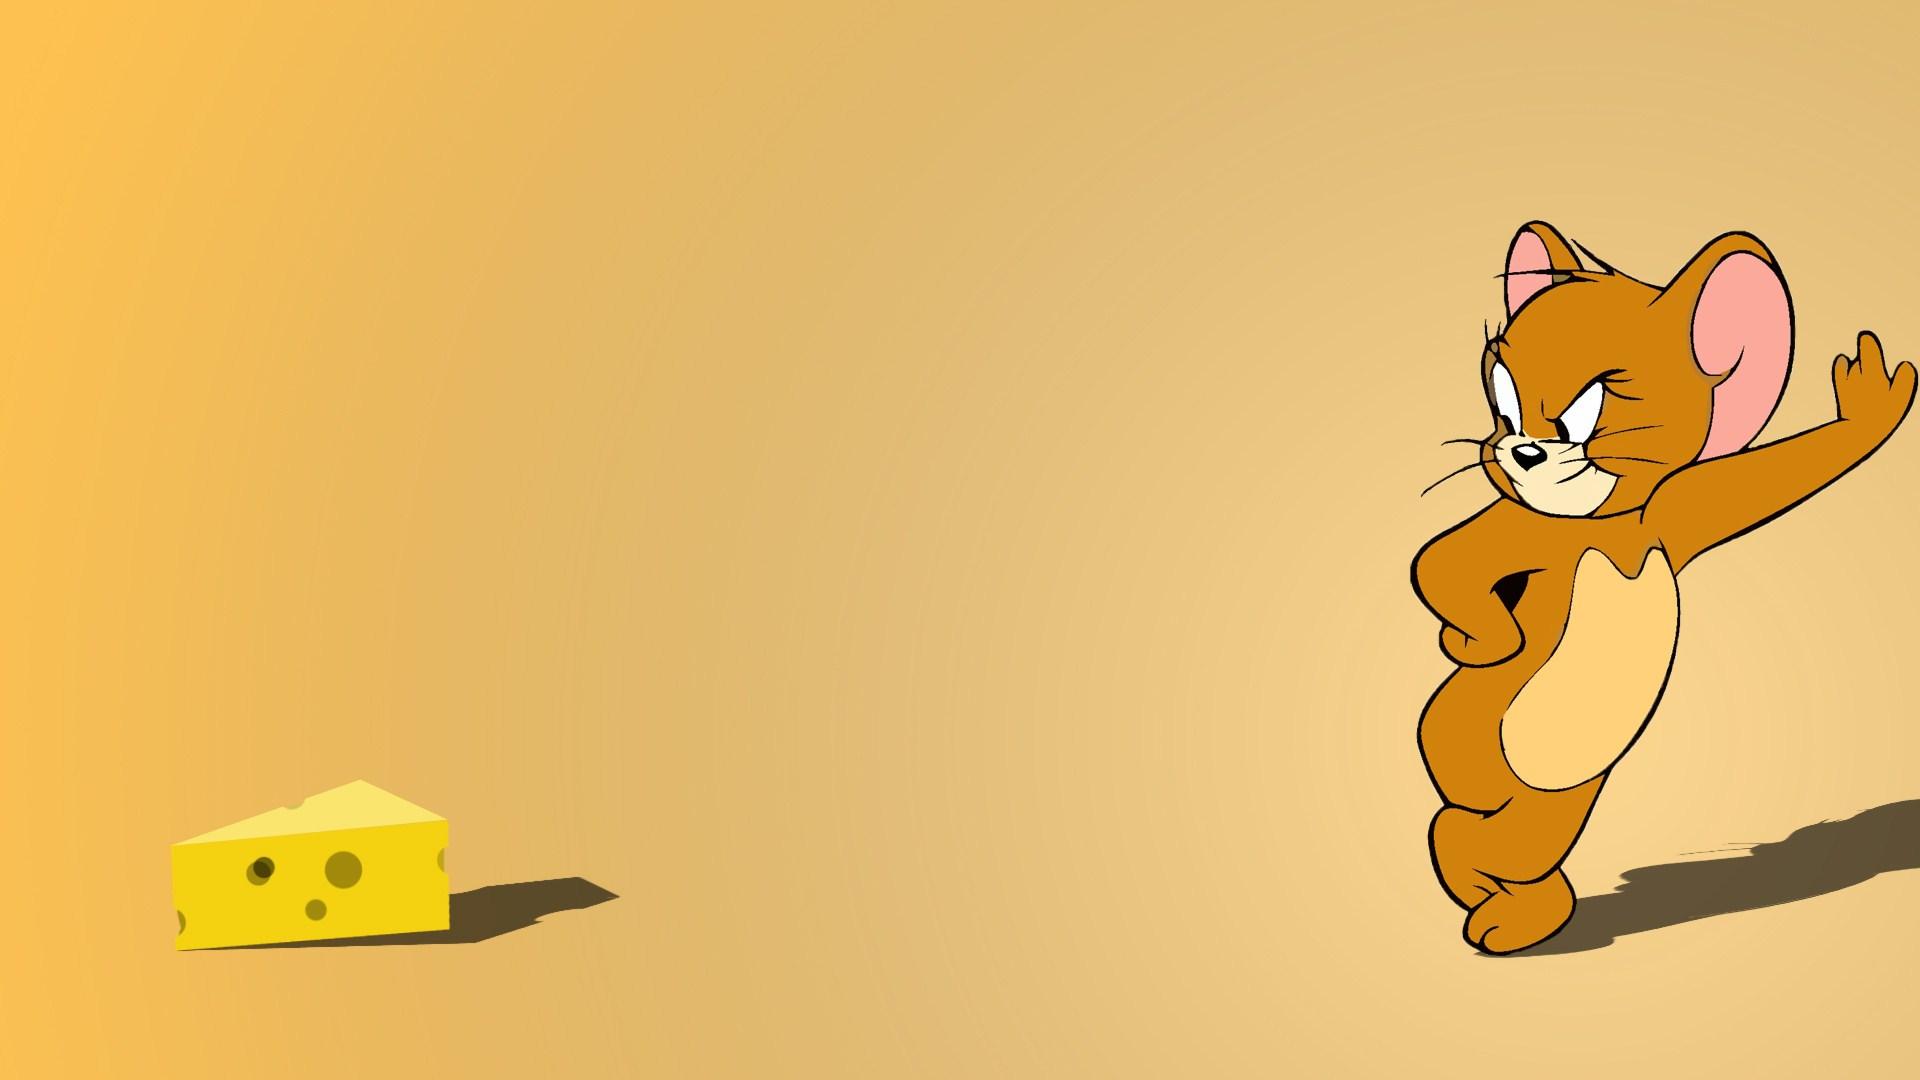 Tom And Jerry Hd Wallpaper Hintergrund 1920x1080 Id